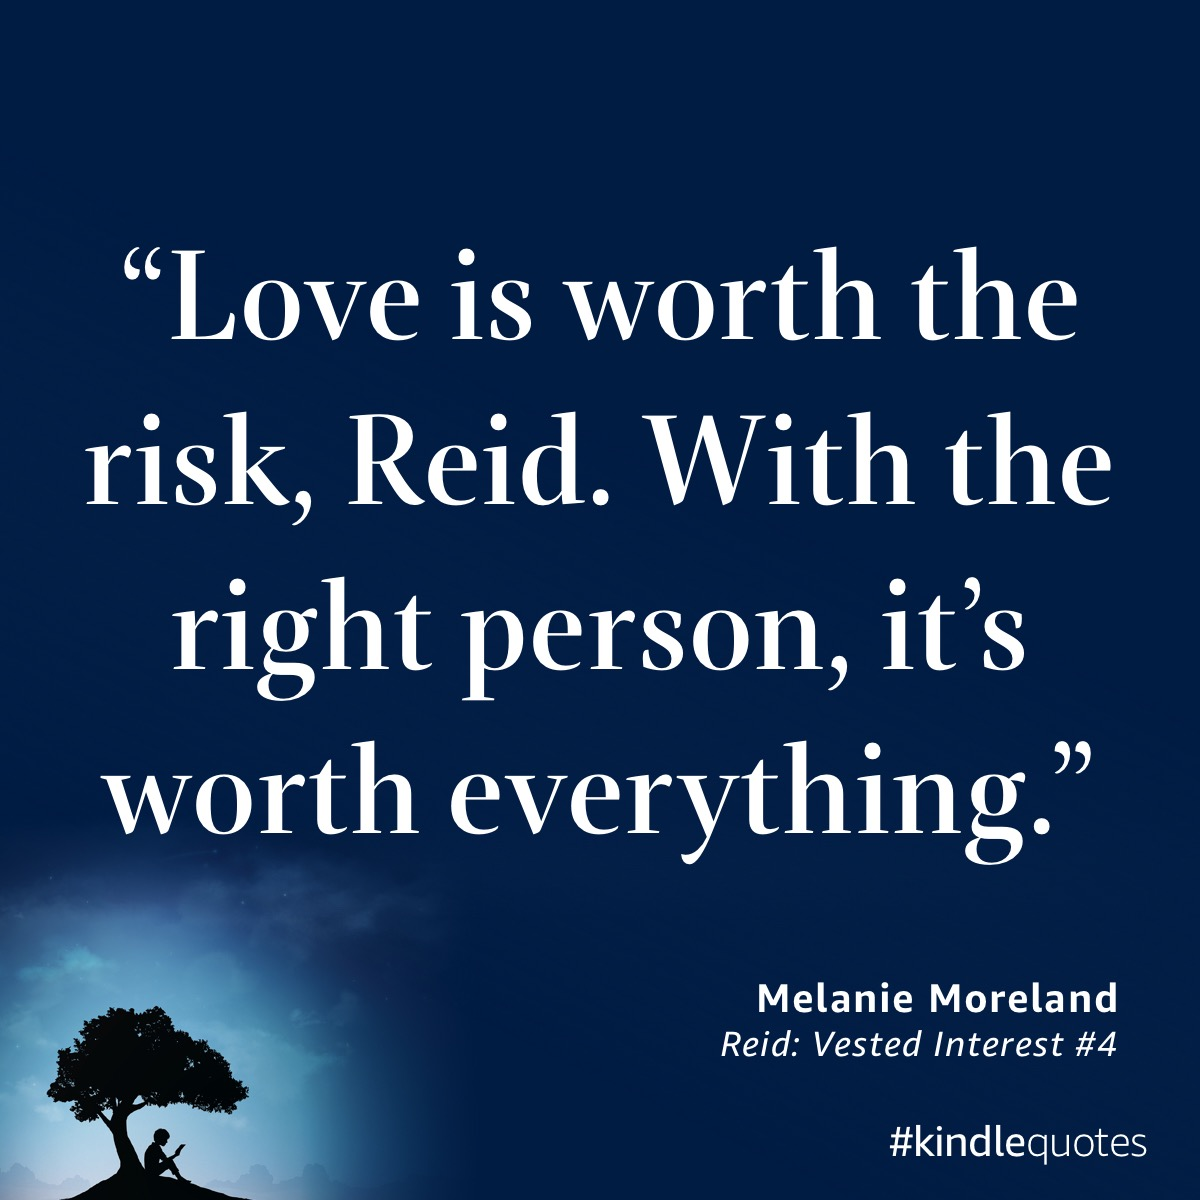 Book quote Melanie Moreland